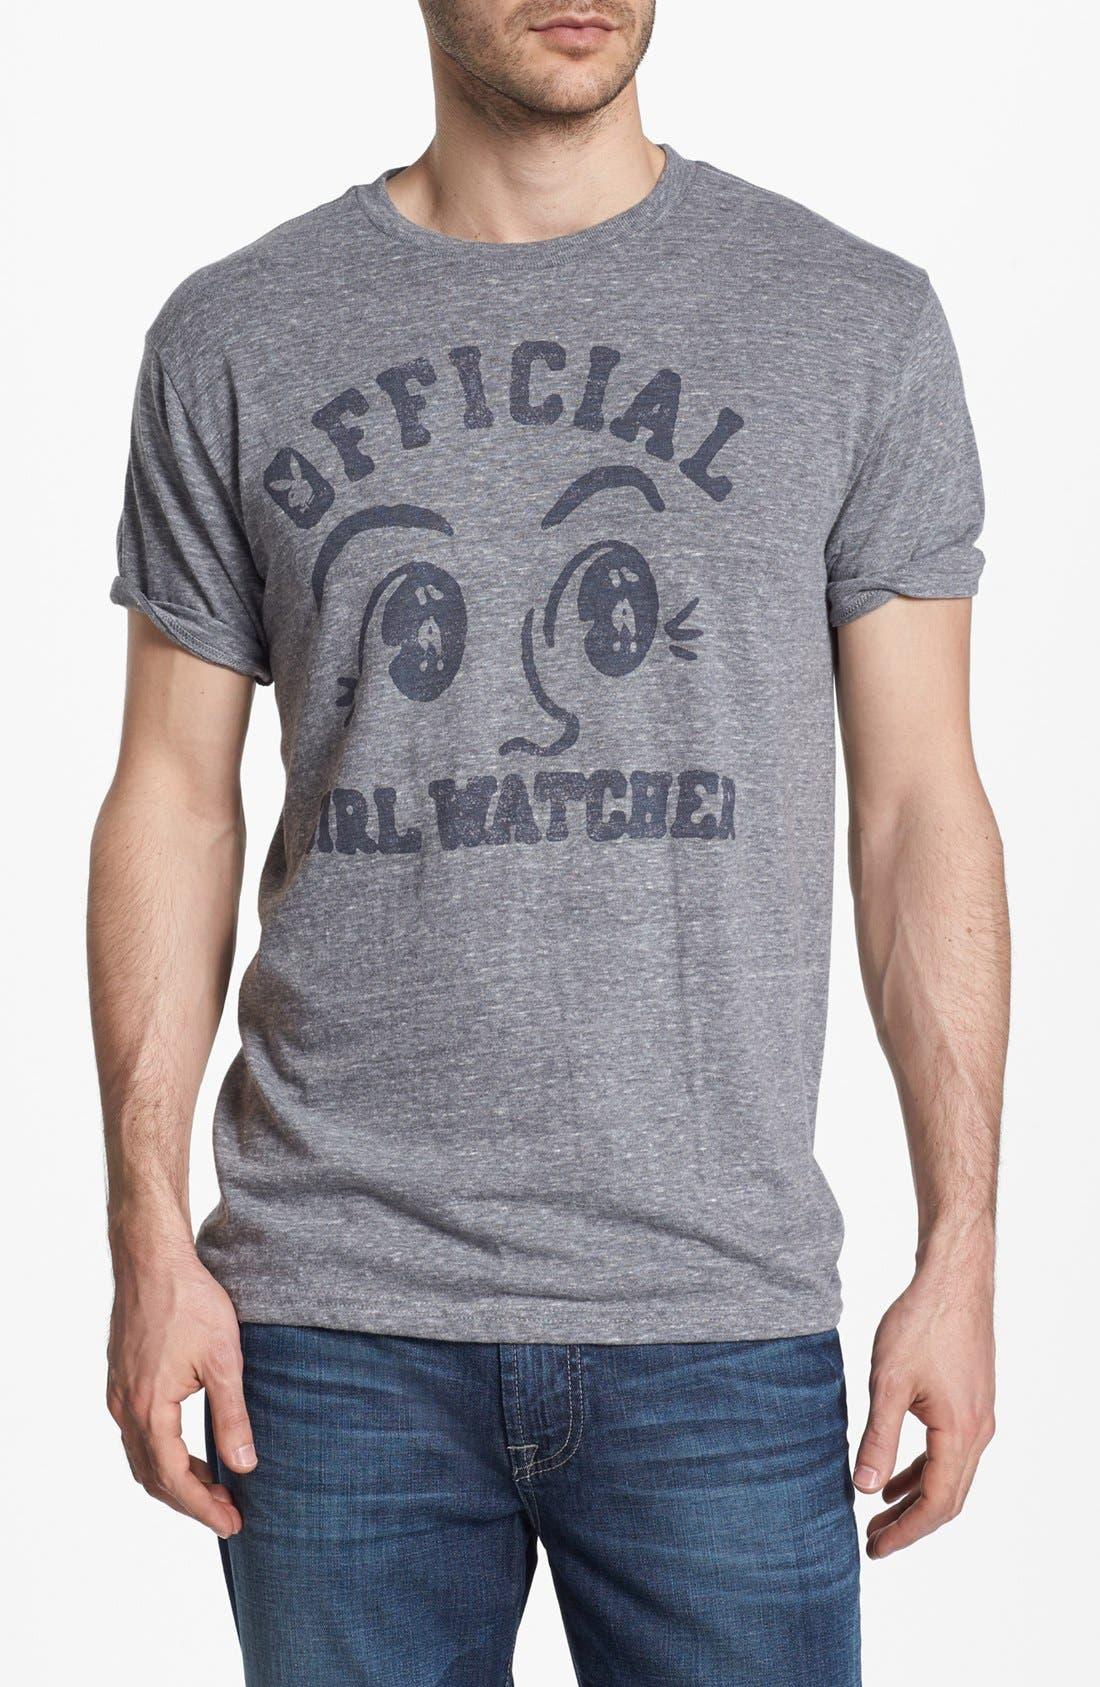 Main Image - PalmerCash 'Official Girl Watcher' Graphic T-Shirt